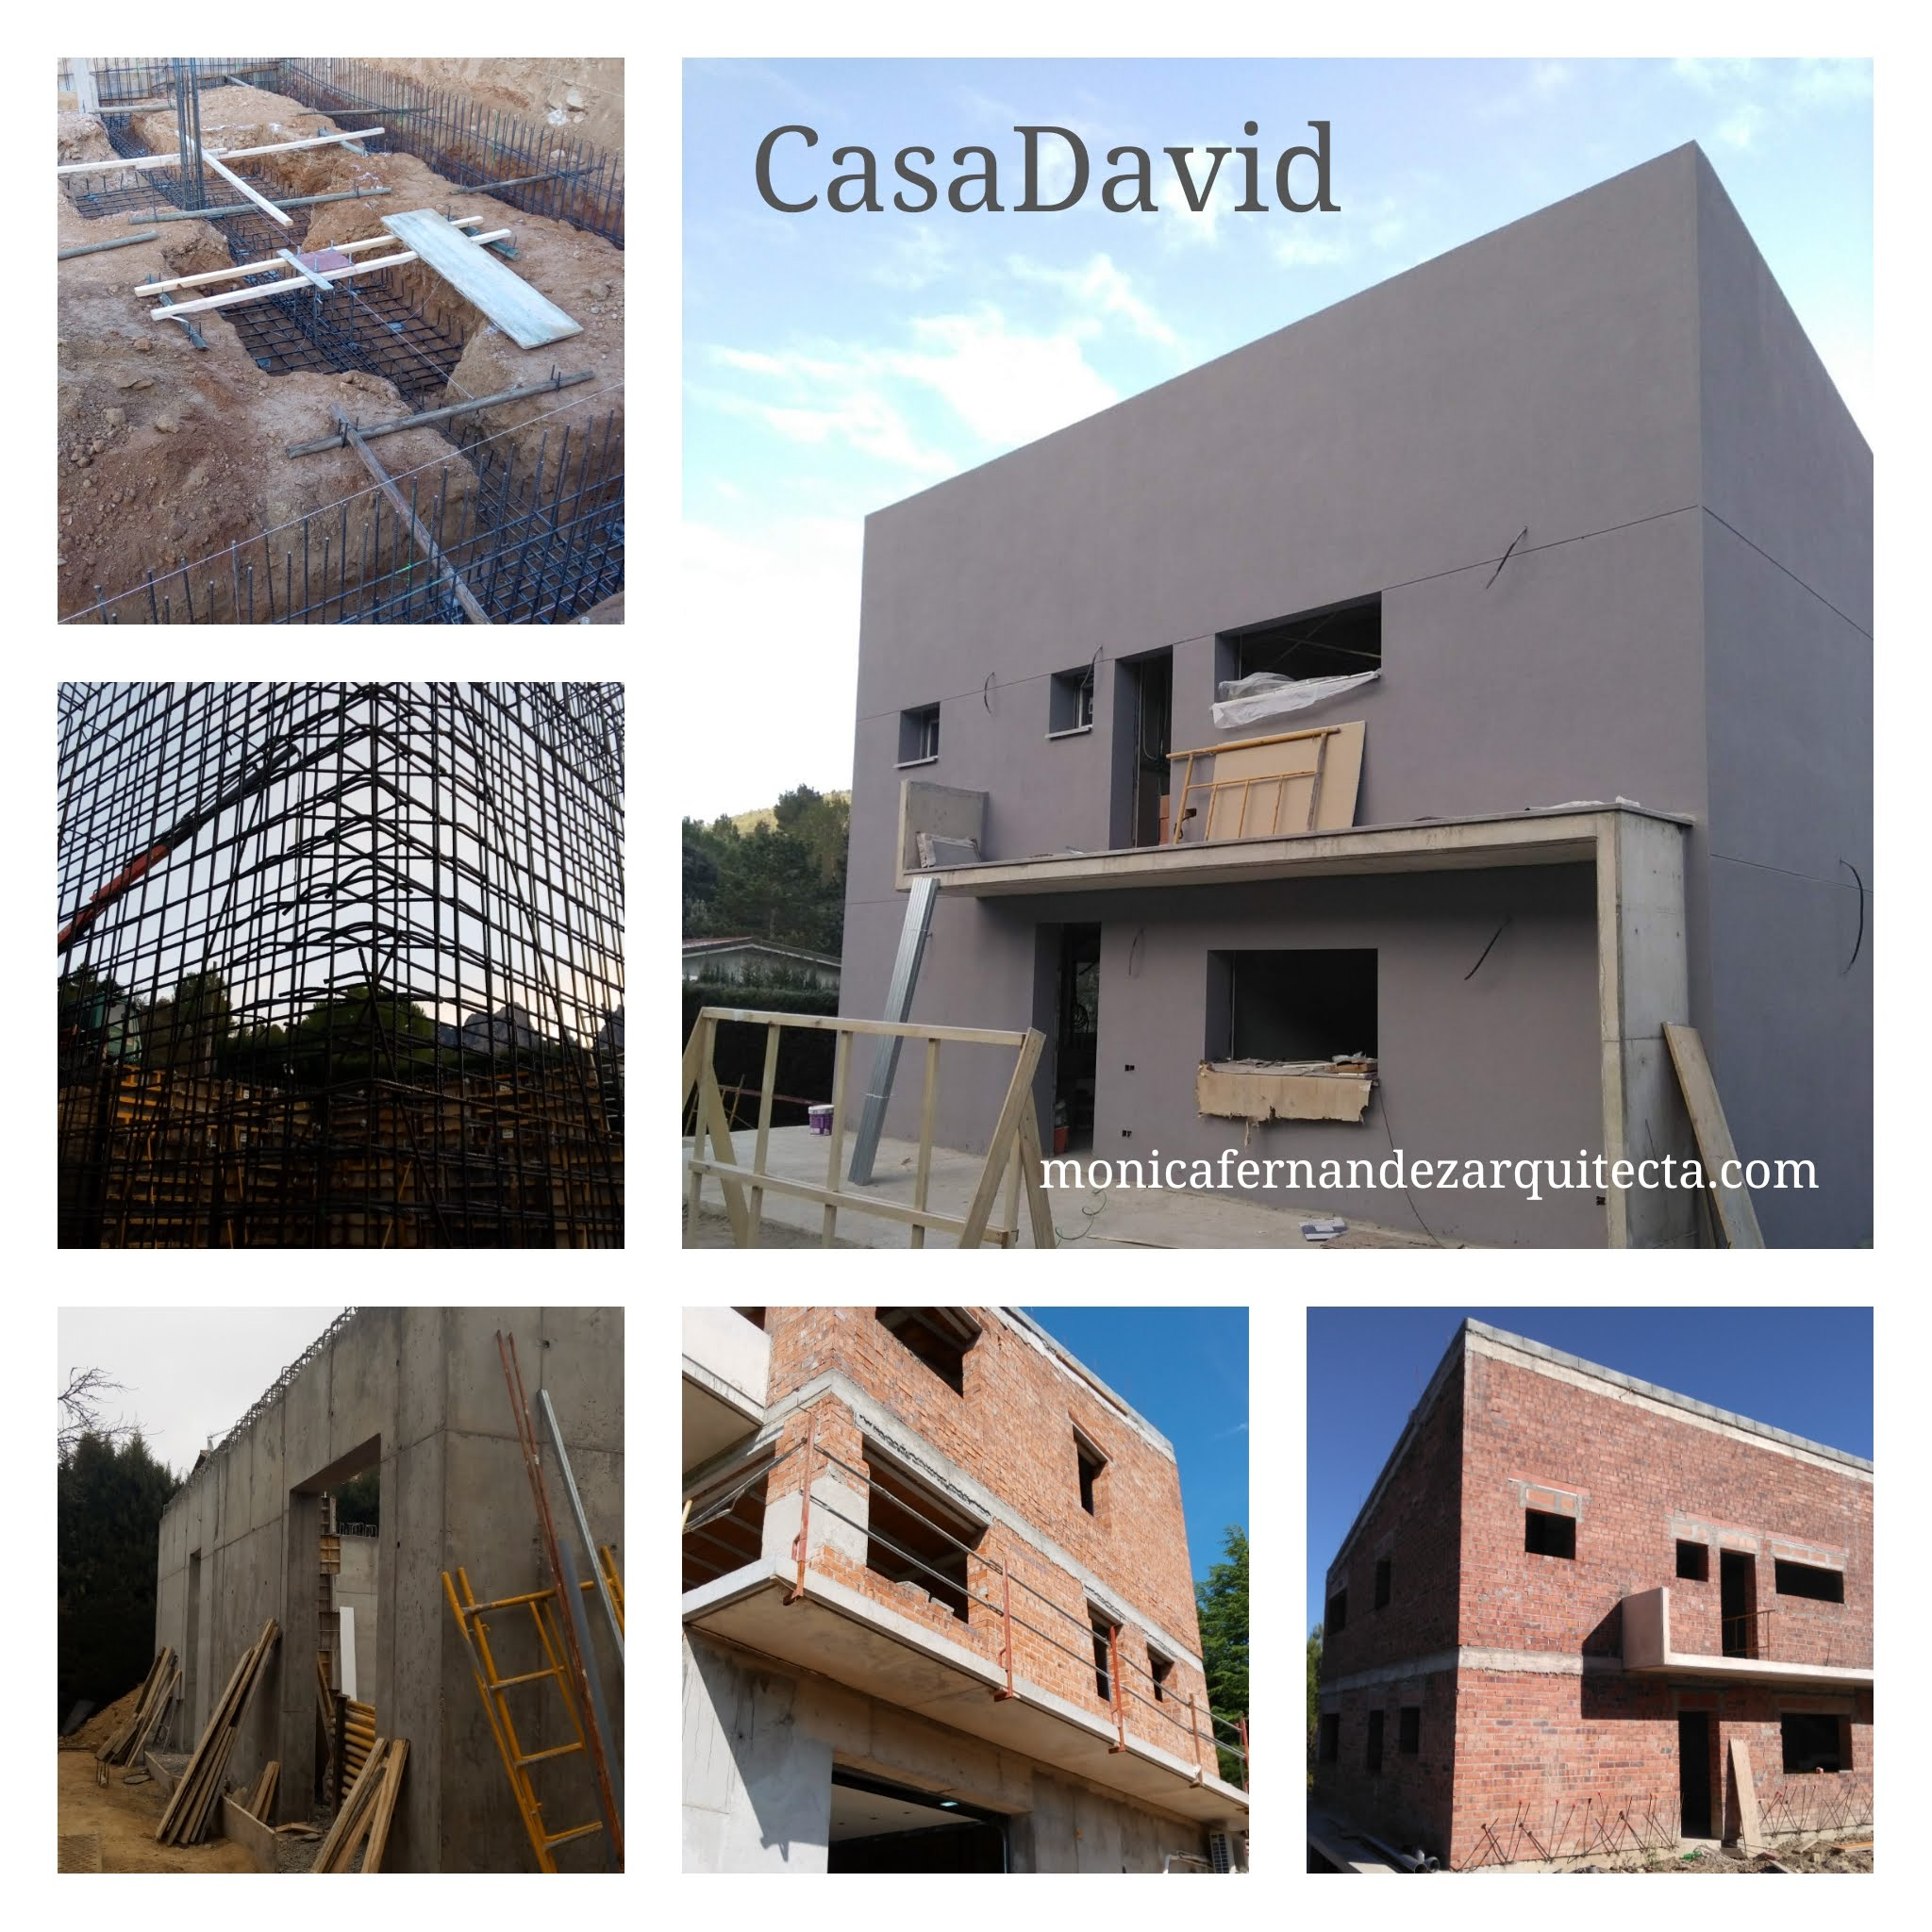 monicafernandezarquitecta.com CasaDavid